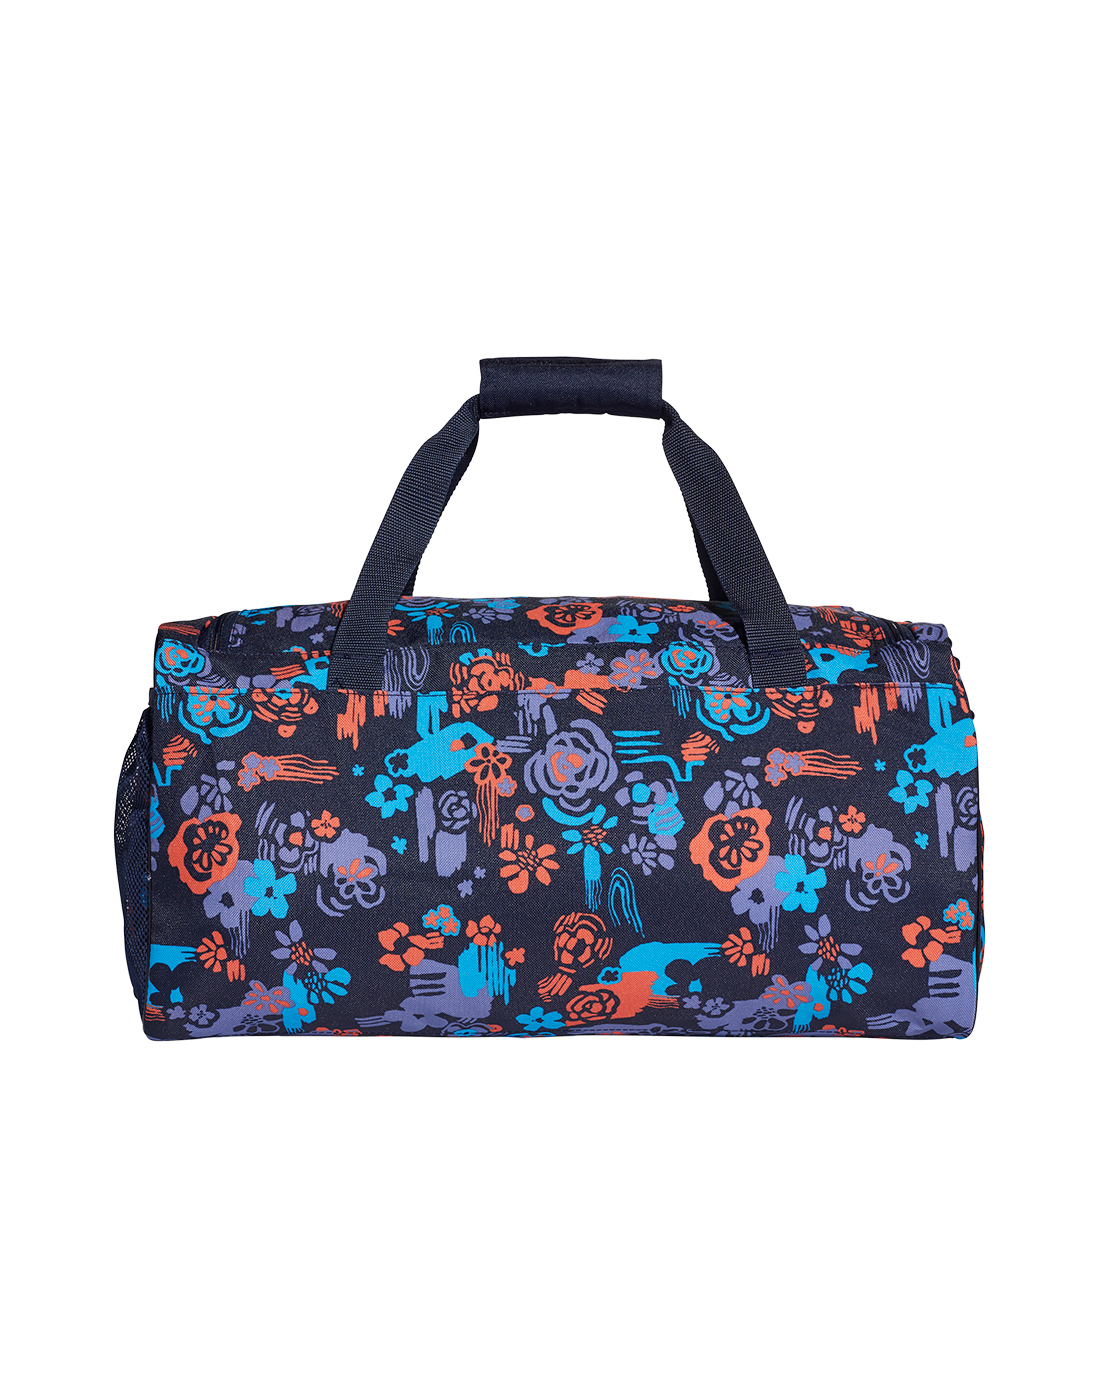 52fff9ef2d Linear Core Small Duffel Bag · Linear Core Small Duffel Bag